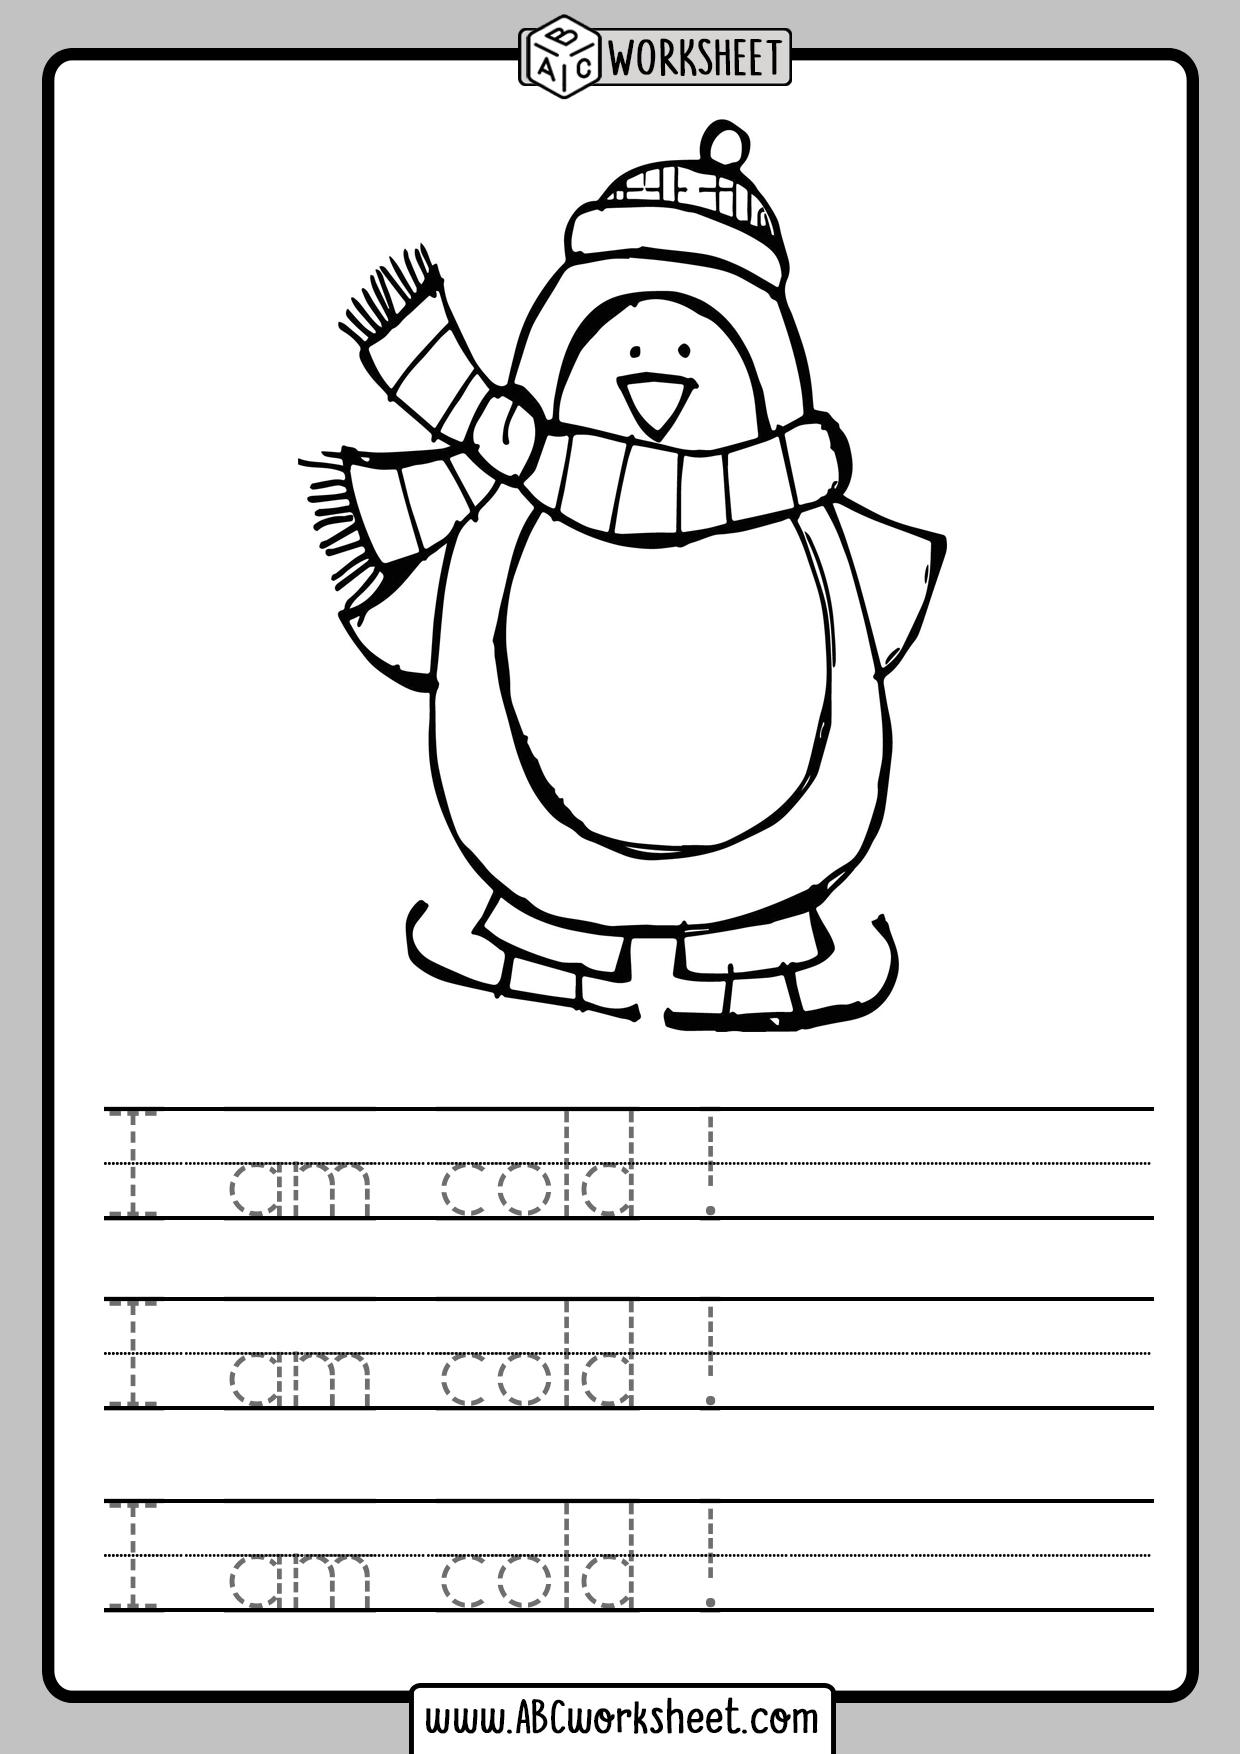 Handwriting Writing Worksheets For Kindergarten